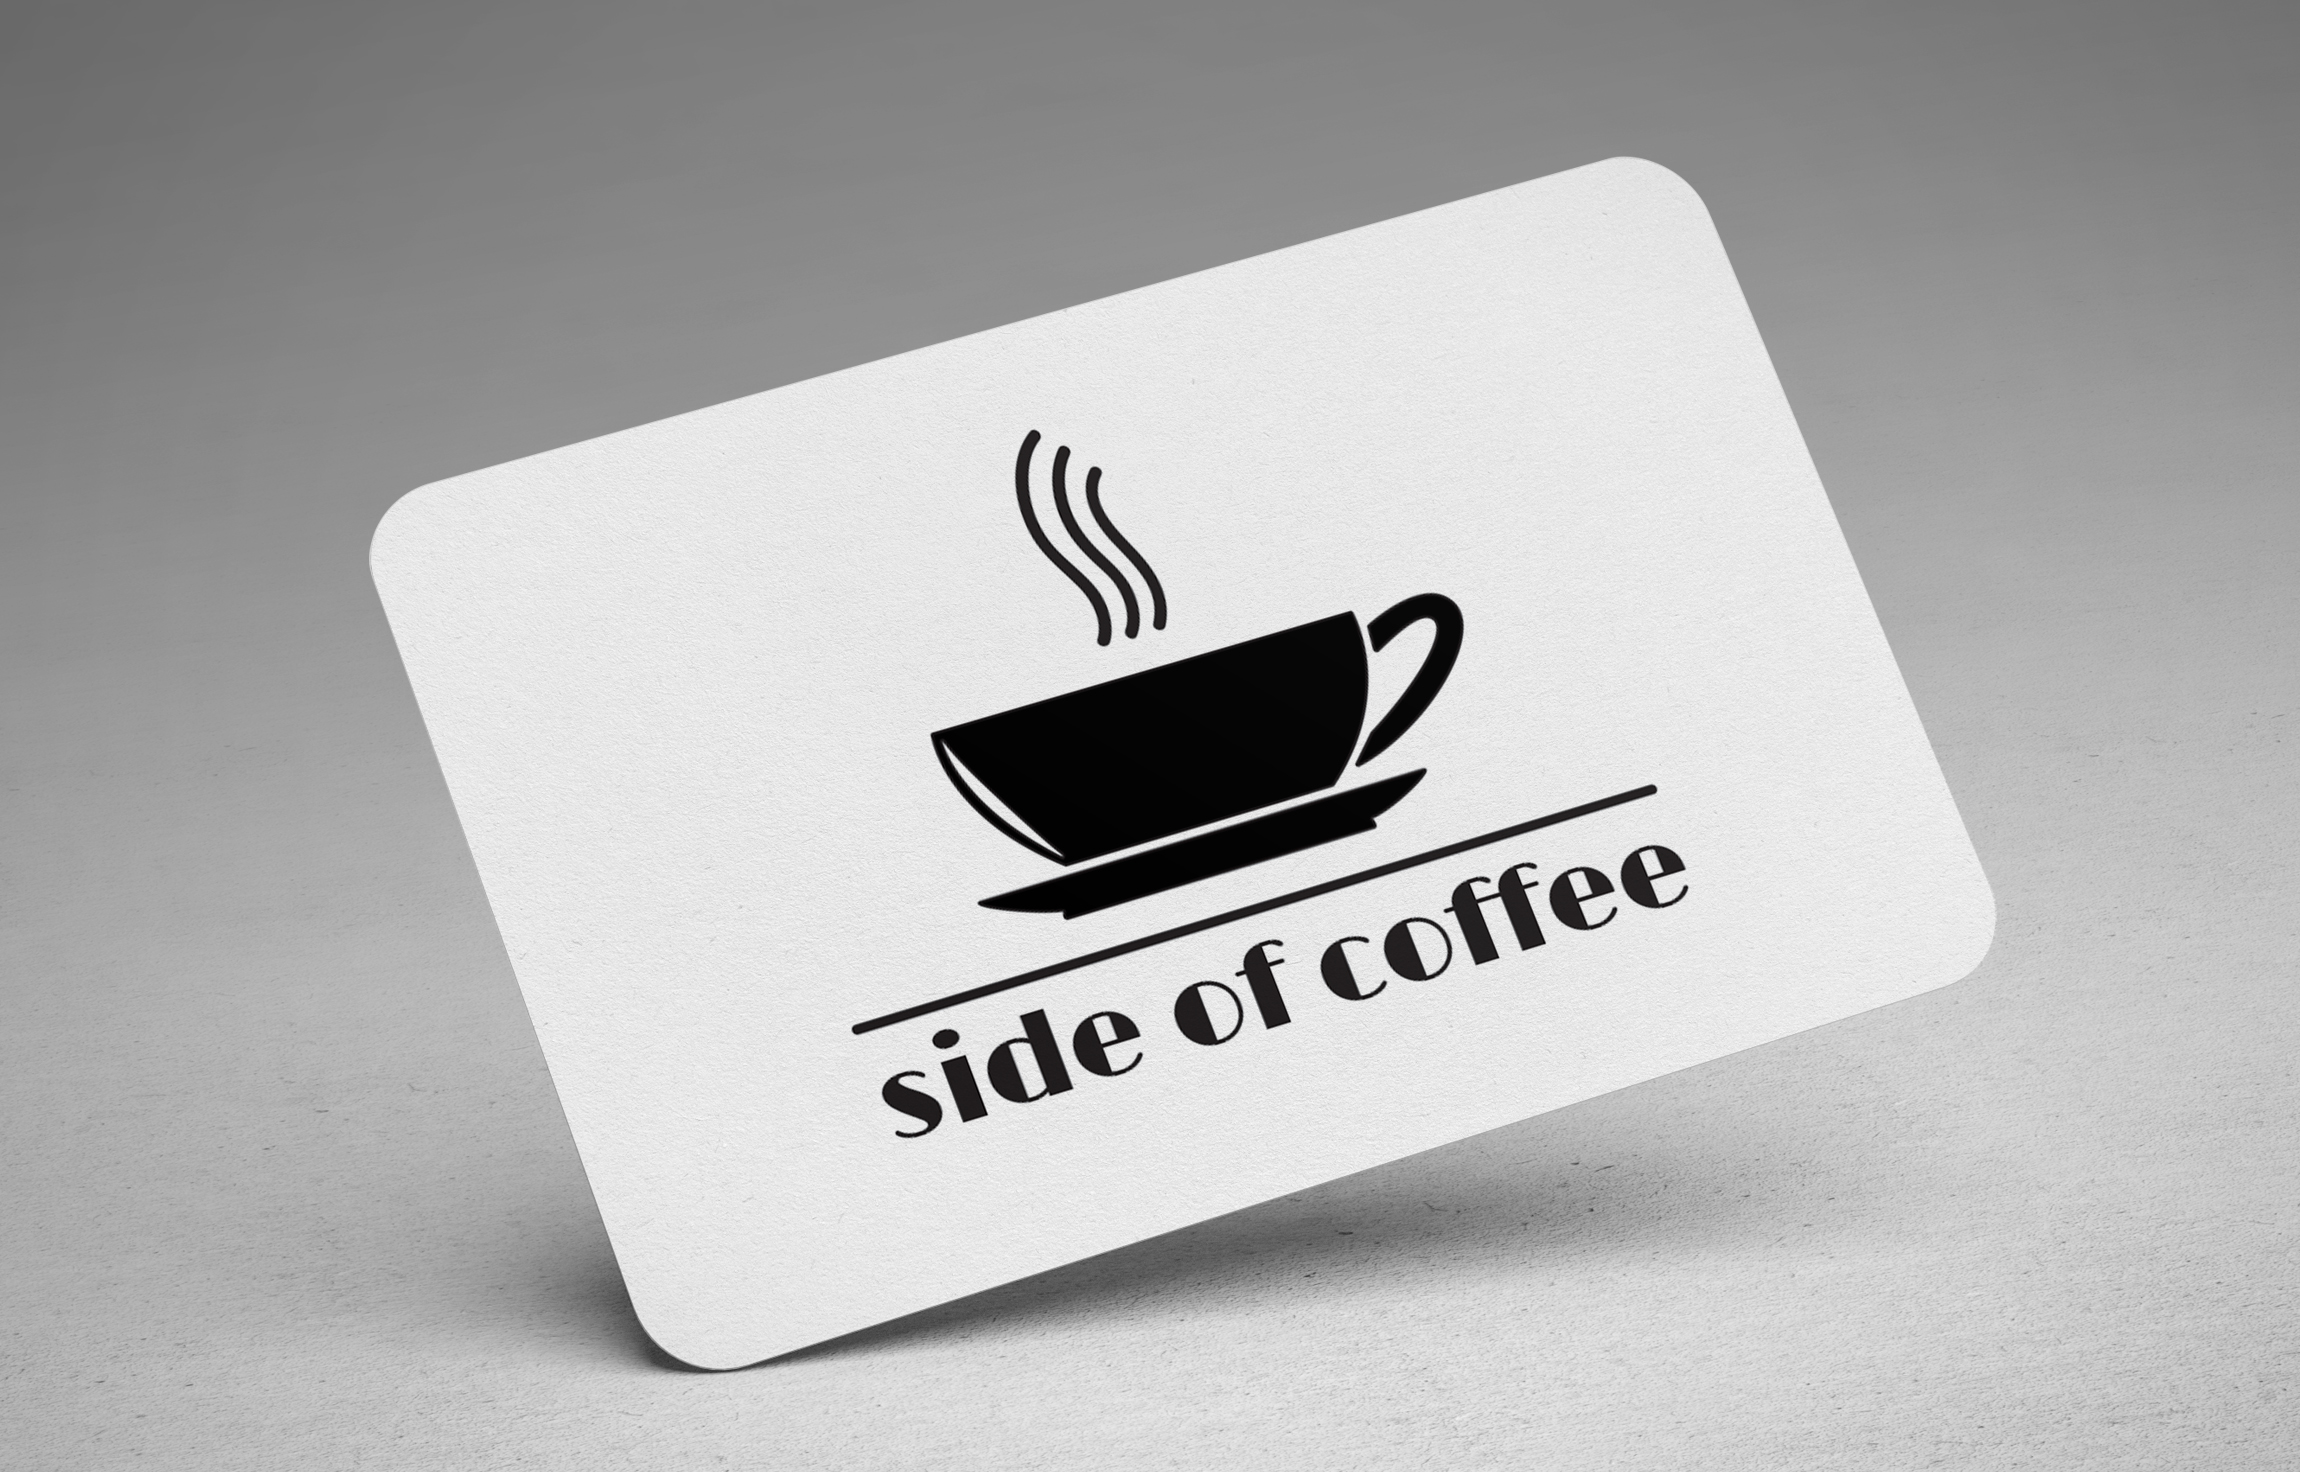 Side of Coffee